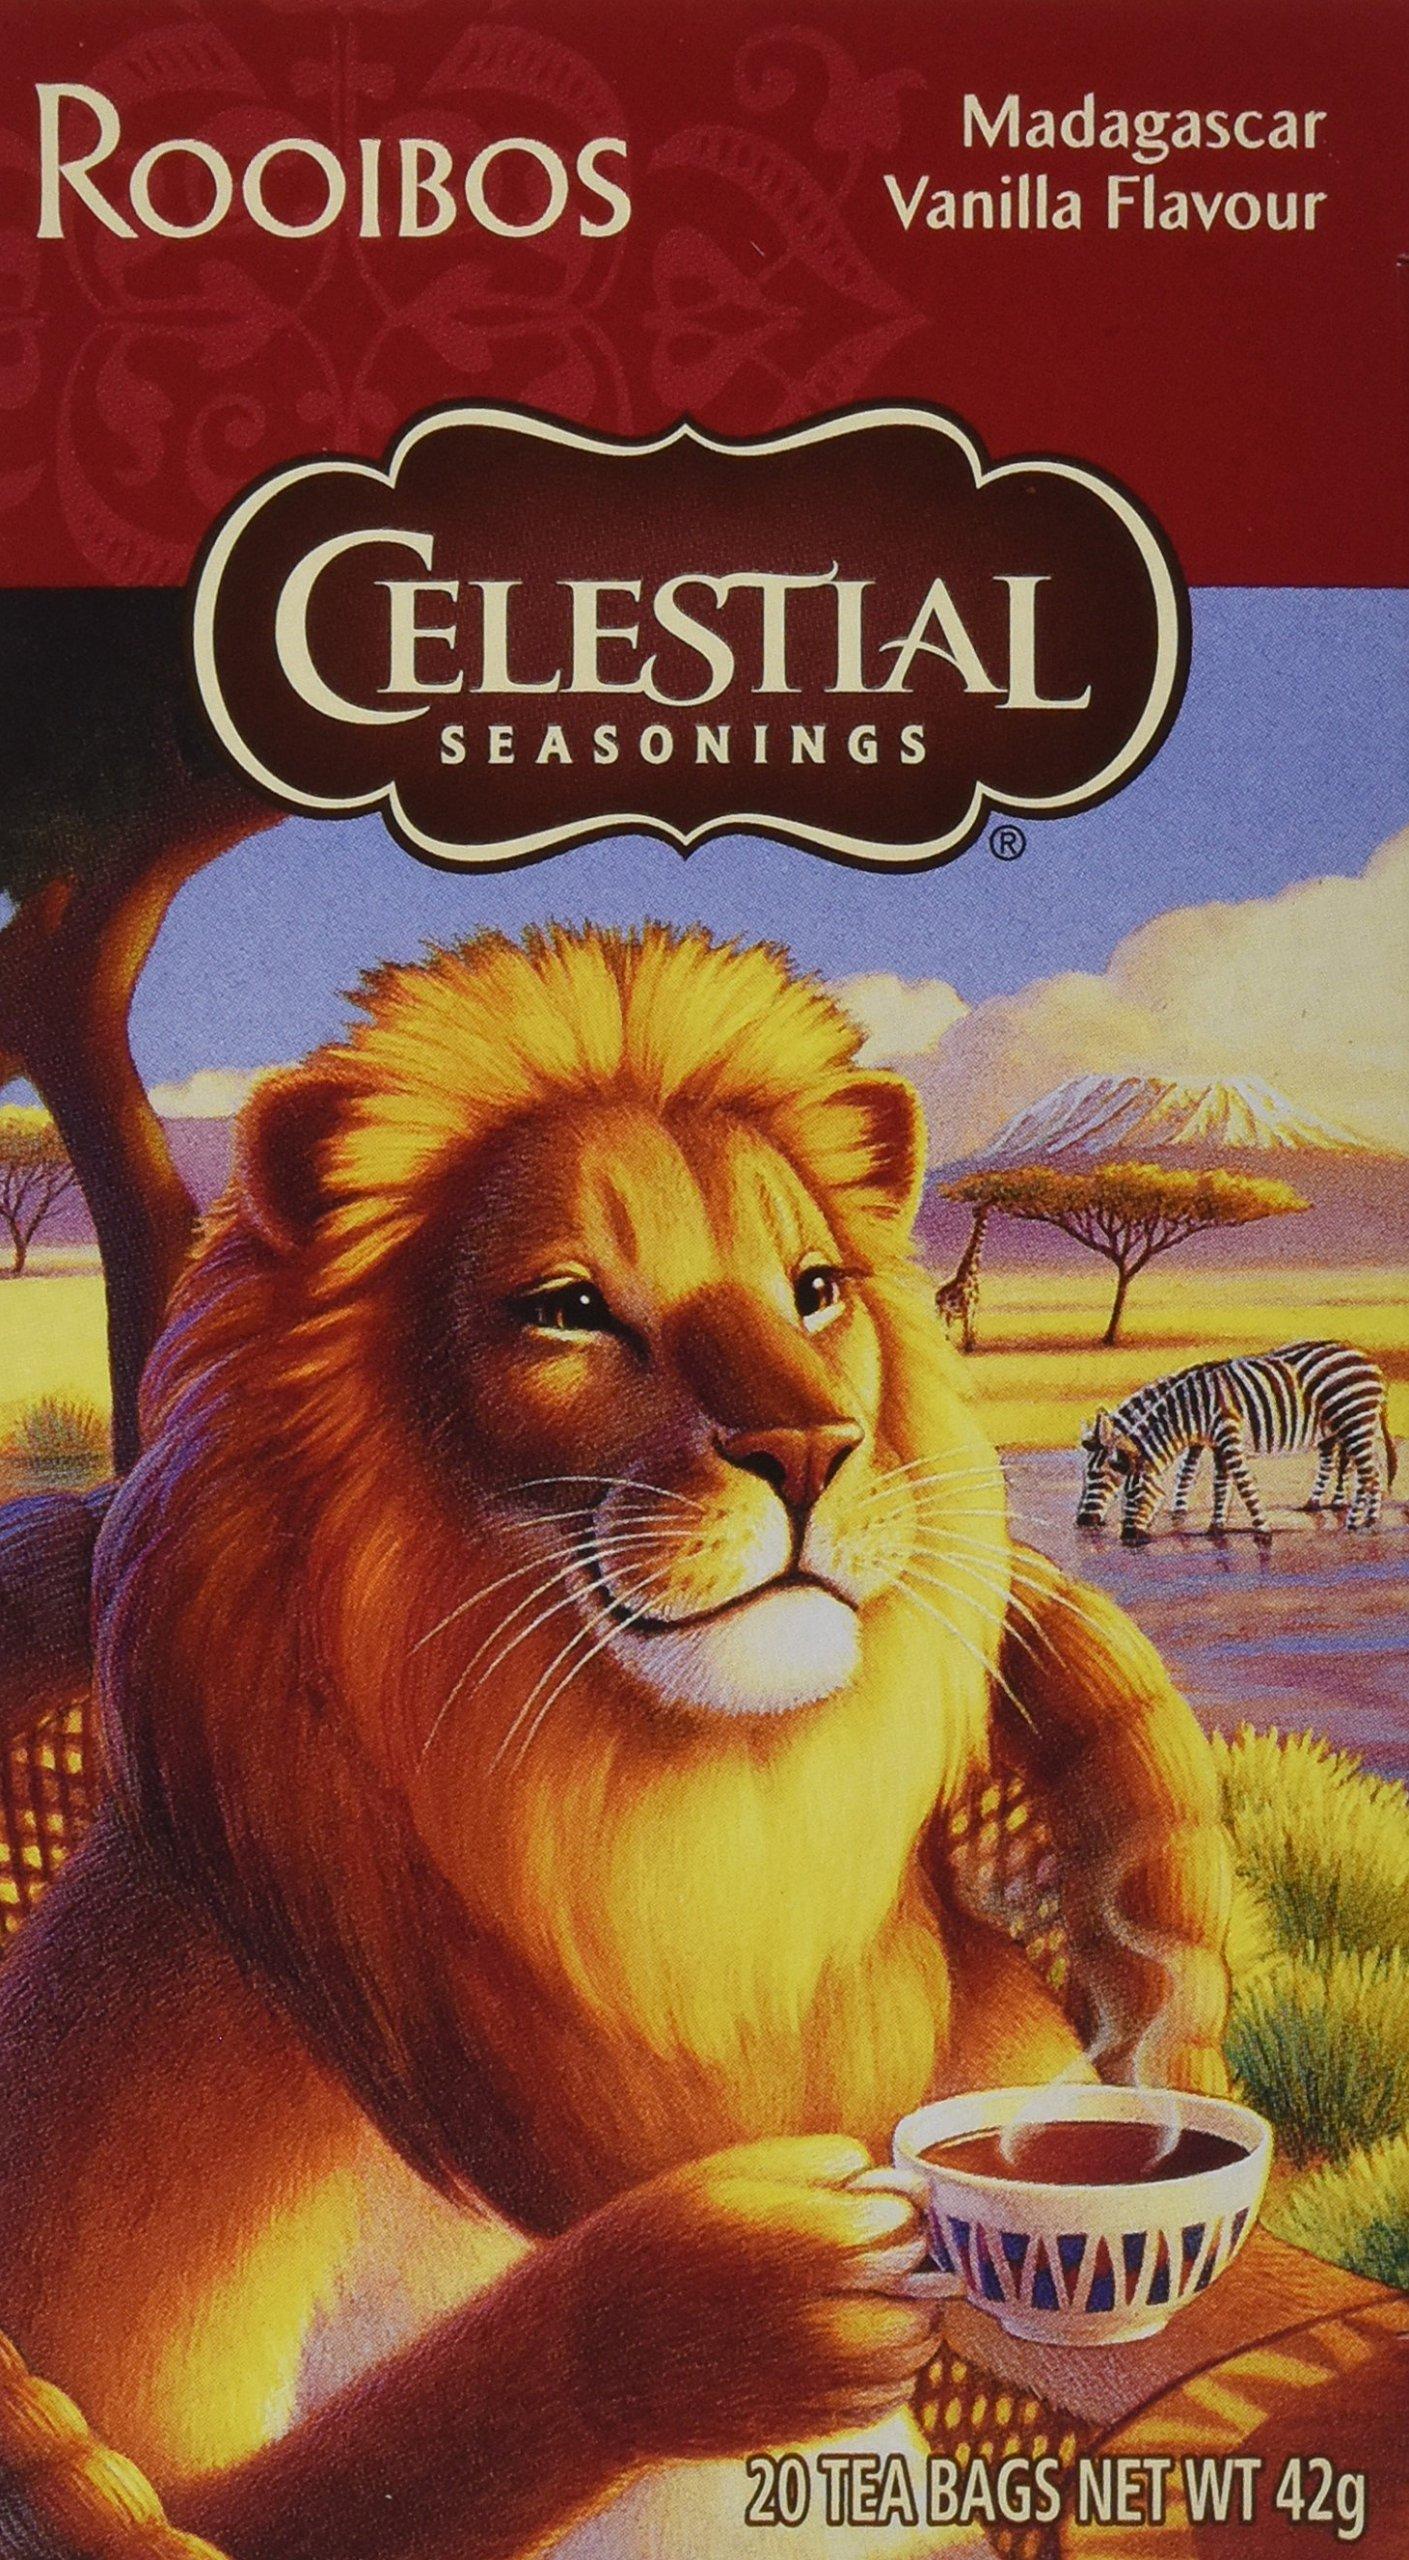 Celestial-Seasonings-Madagascar-Vanilla-Rooibos-6er-Pack-6-x-42-g